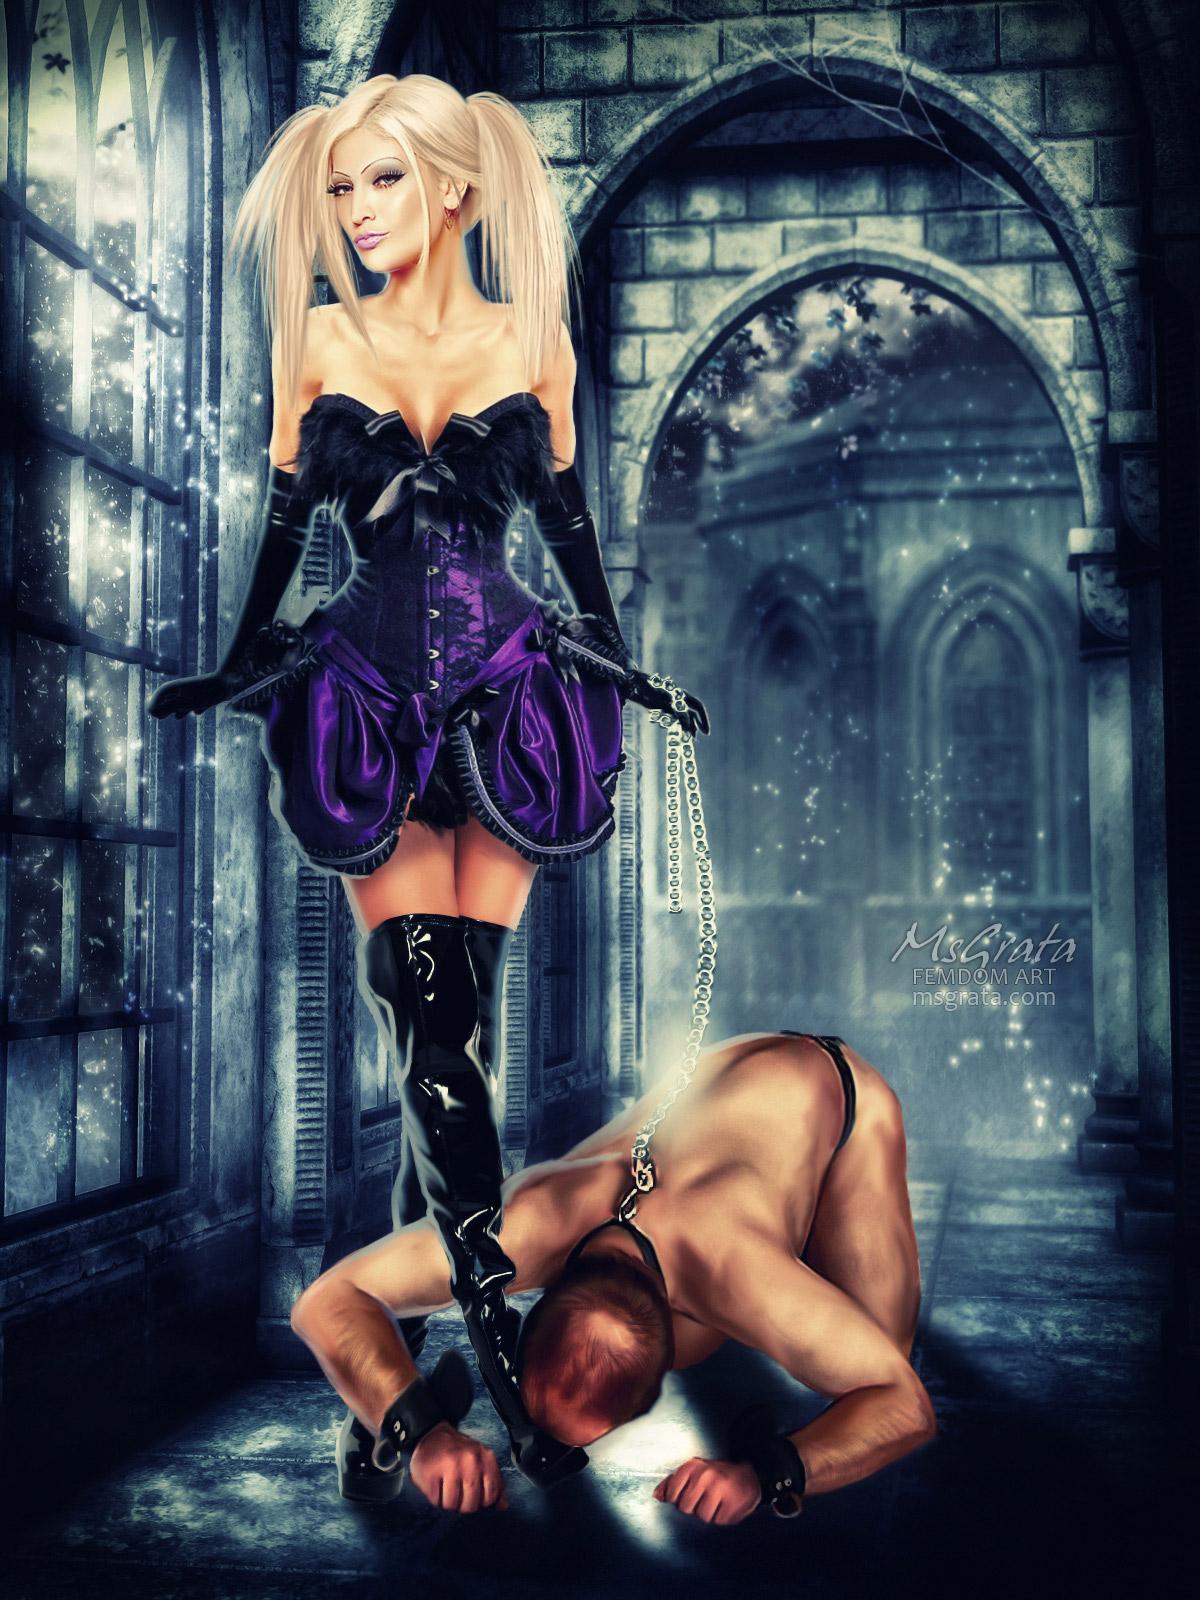 Medieval femdom art fantasy Get In! under her feet by MsGrata